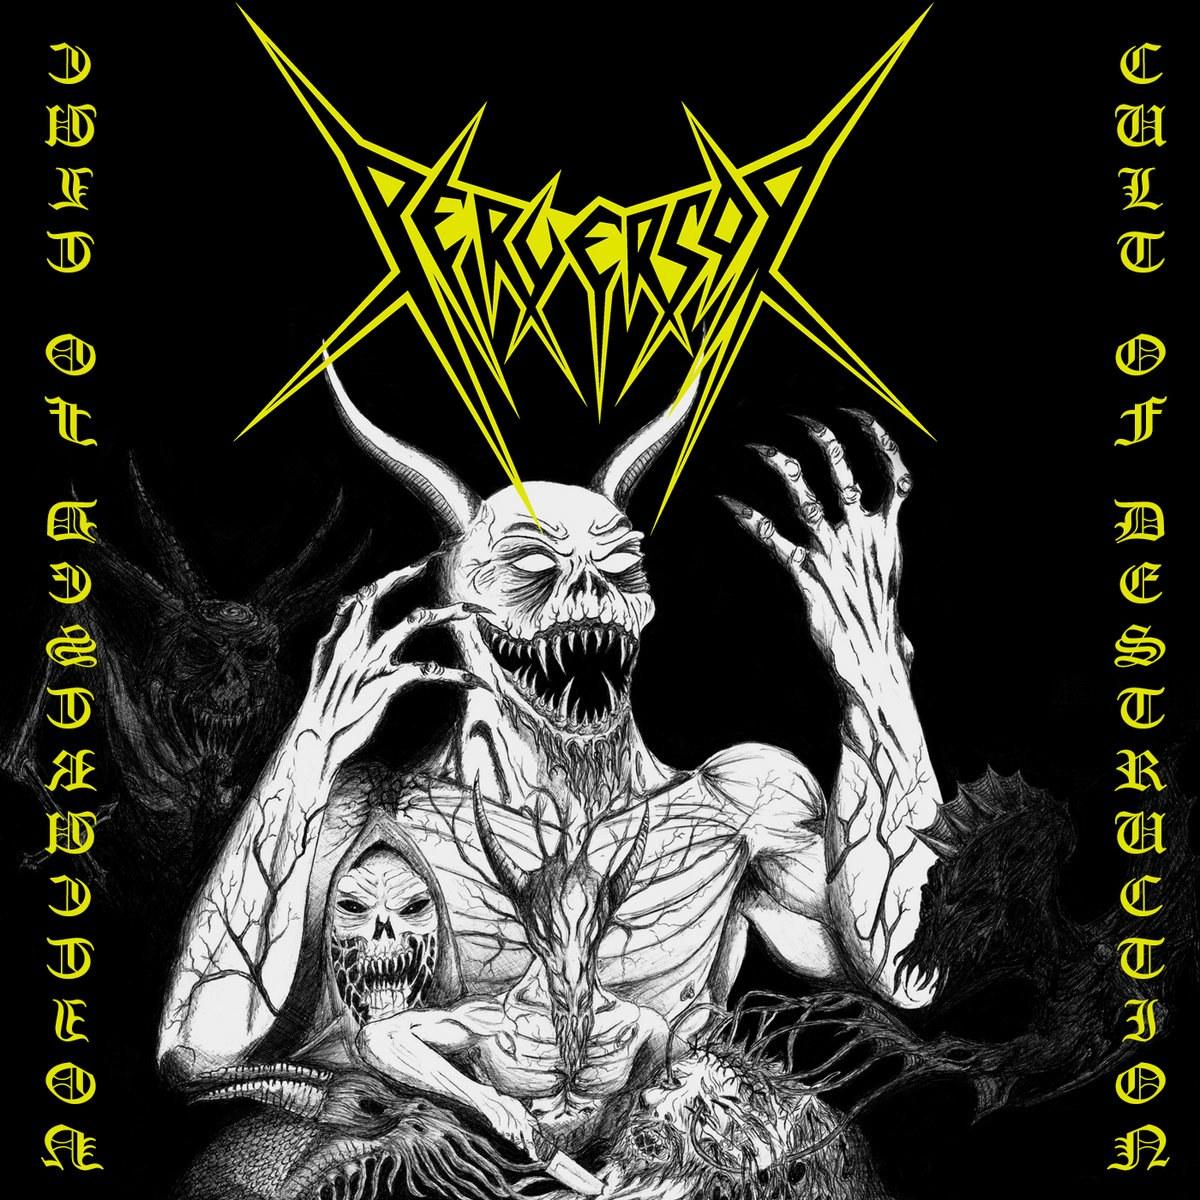 Review for Perversor - Cult of Destruction